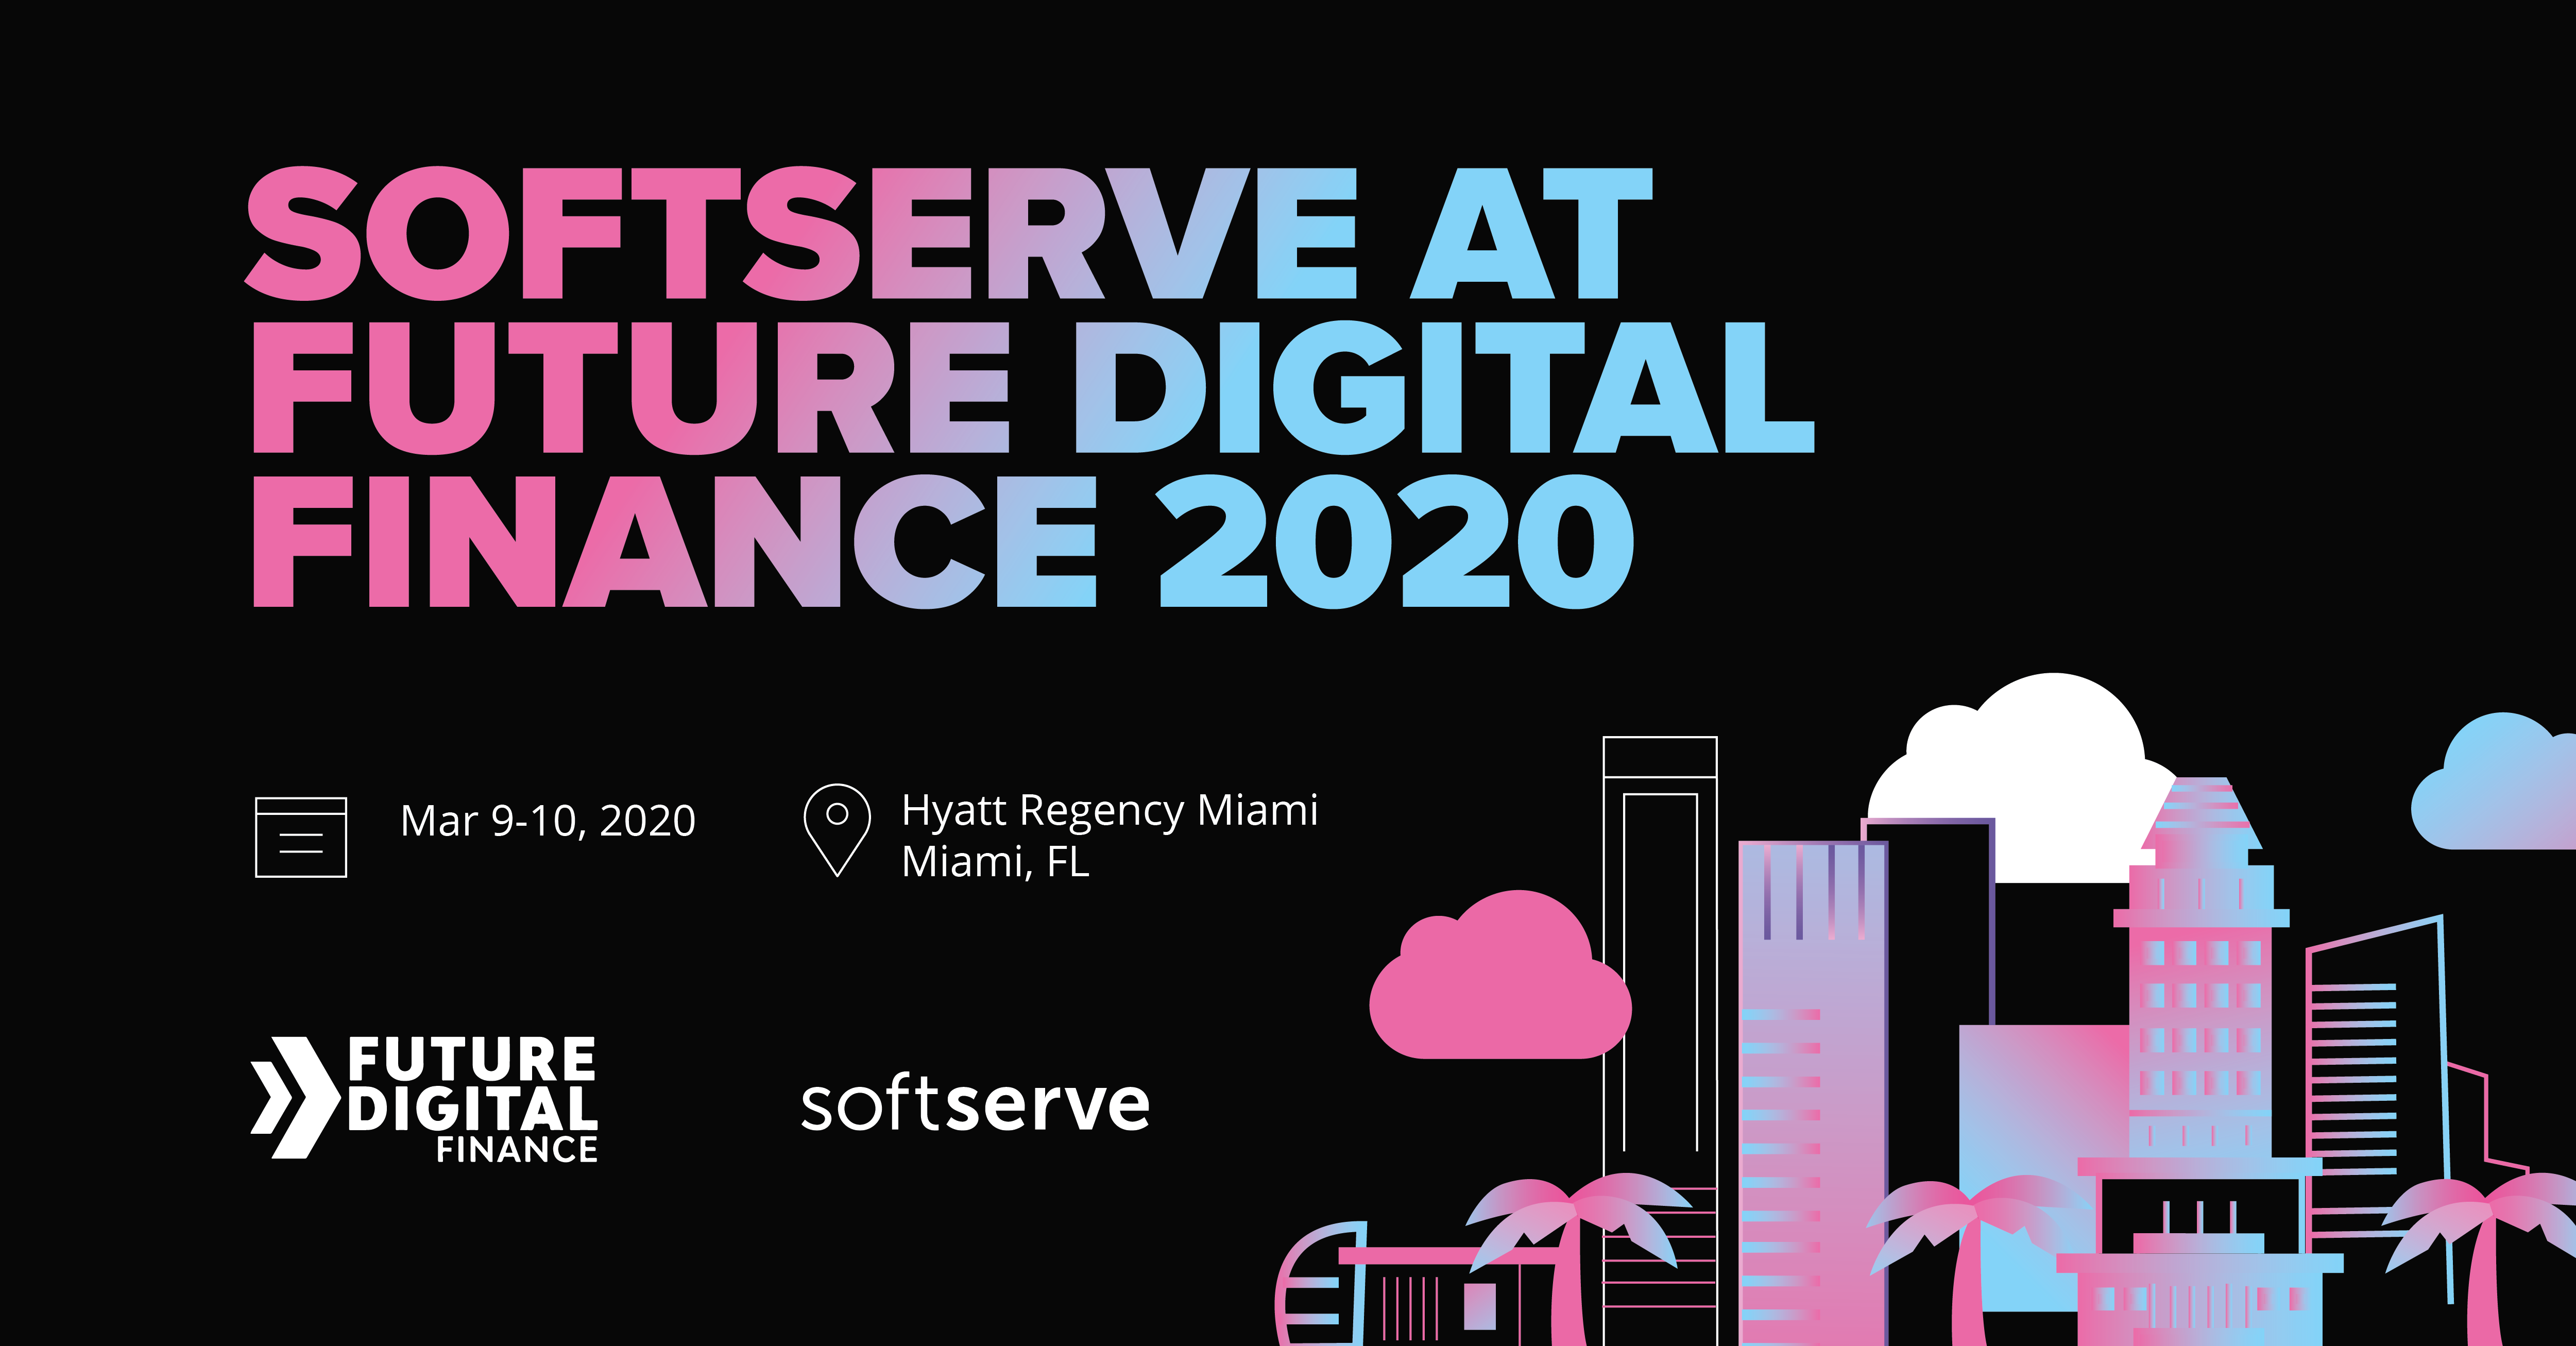 softserve-at-future-digital-finance-2020